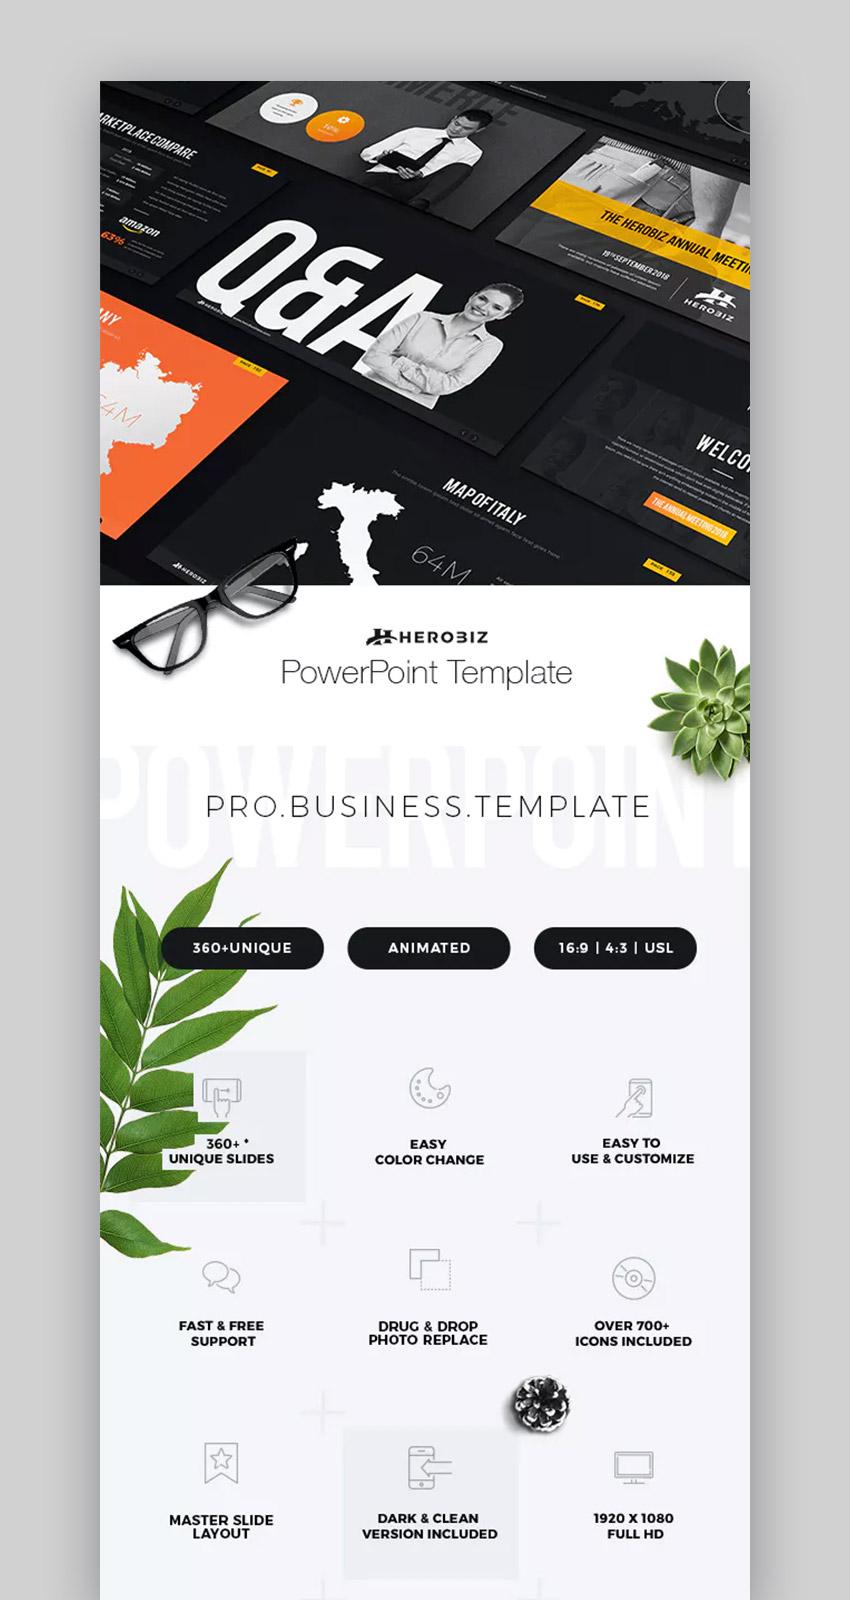 Herobiz Business Plan Presentation PPT